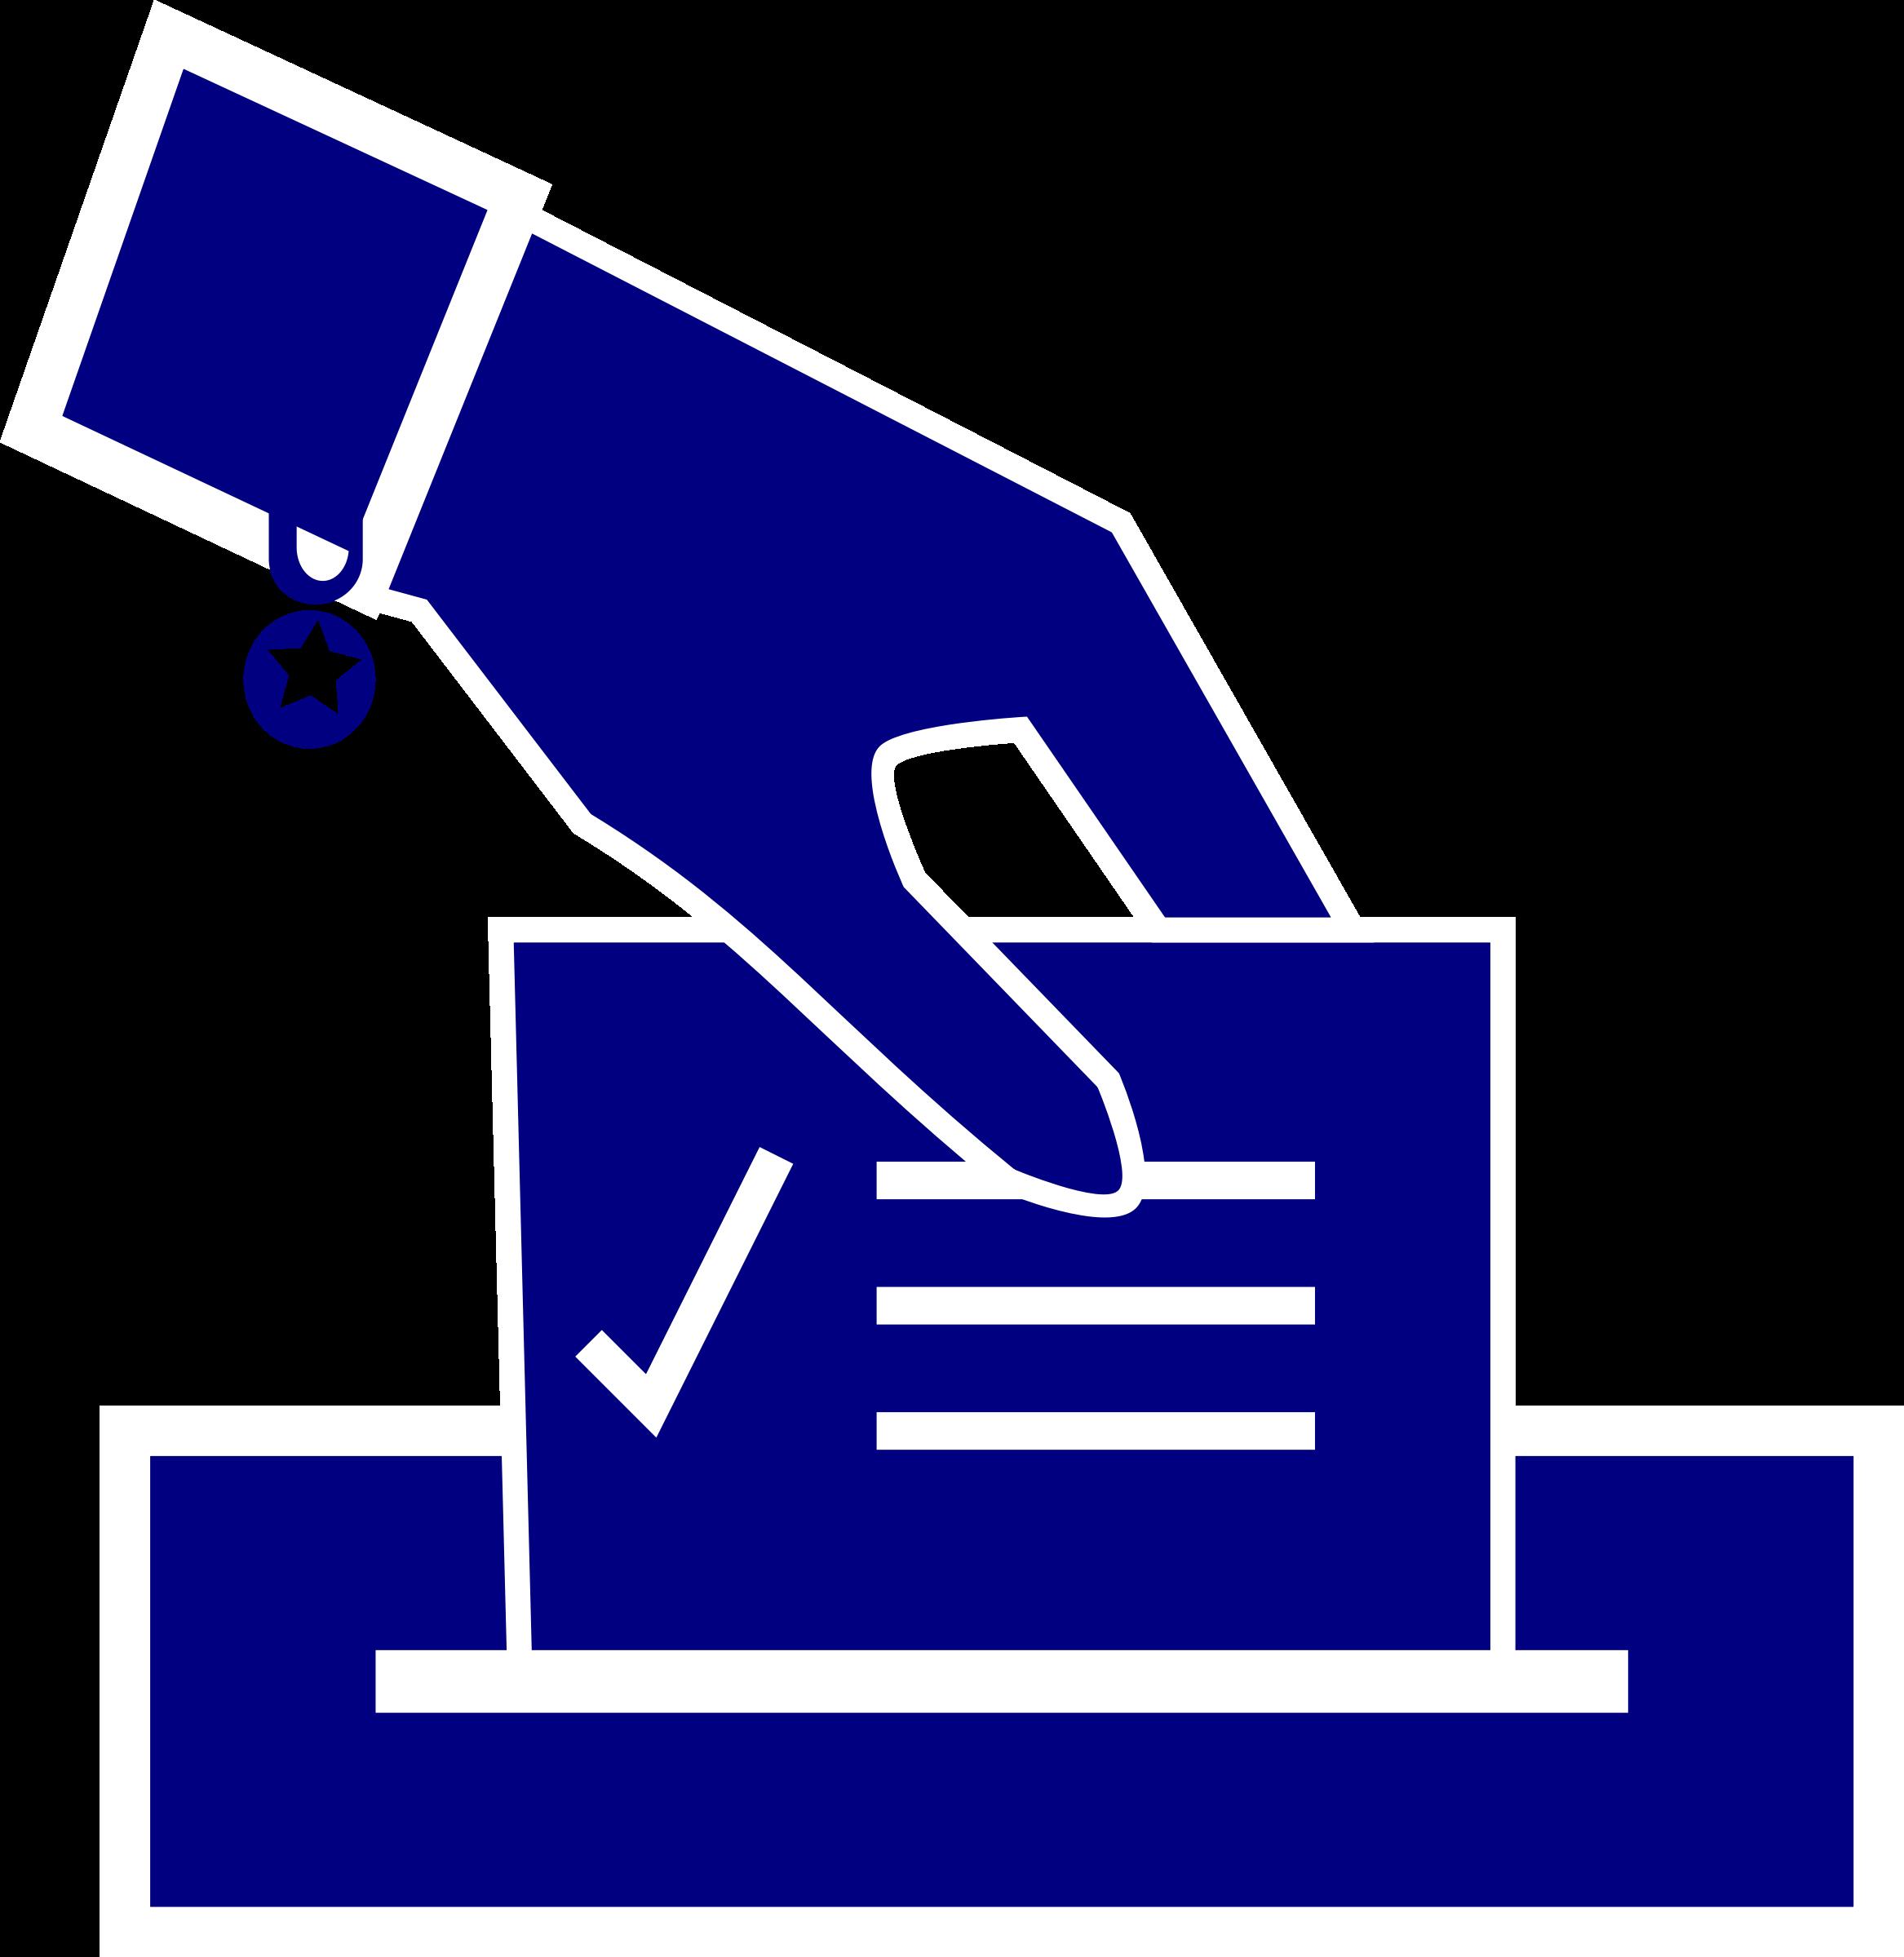 Box voting clip art. Election clipart ballot